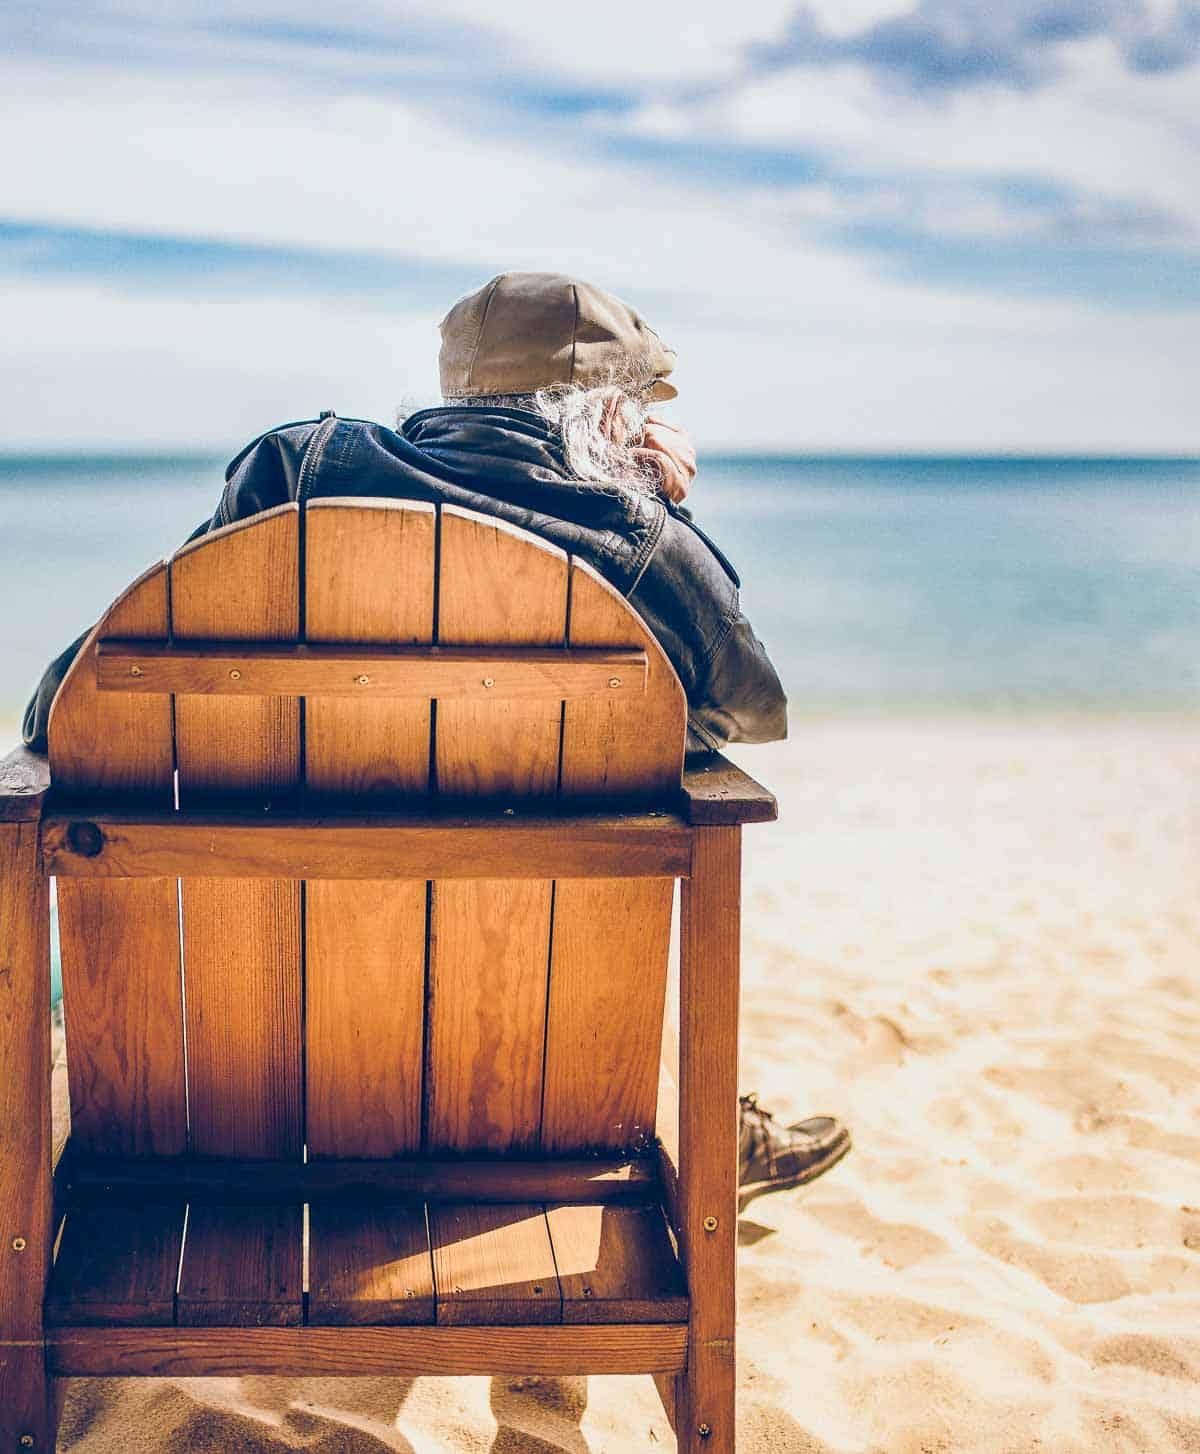 beach chair for an older person